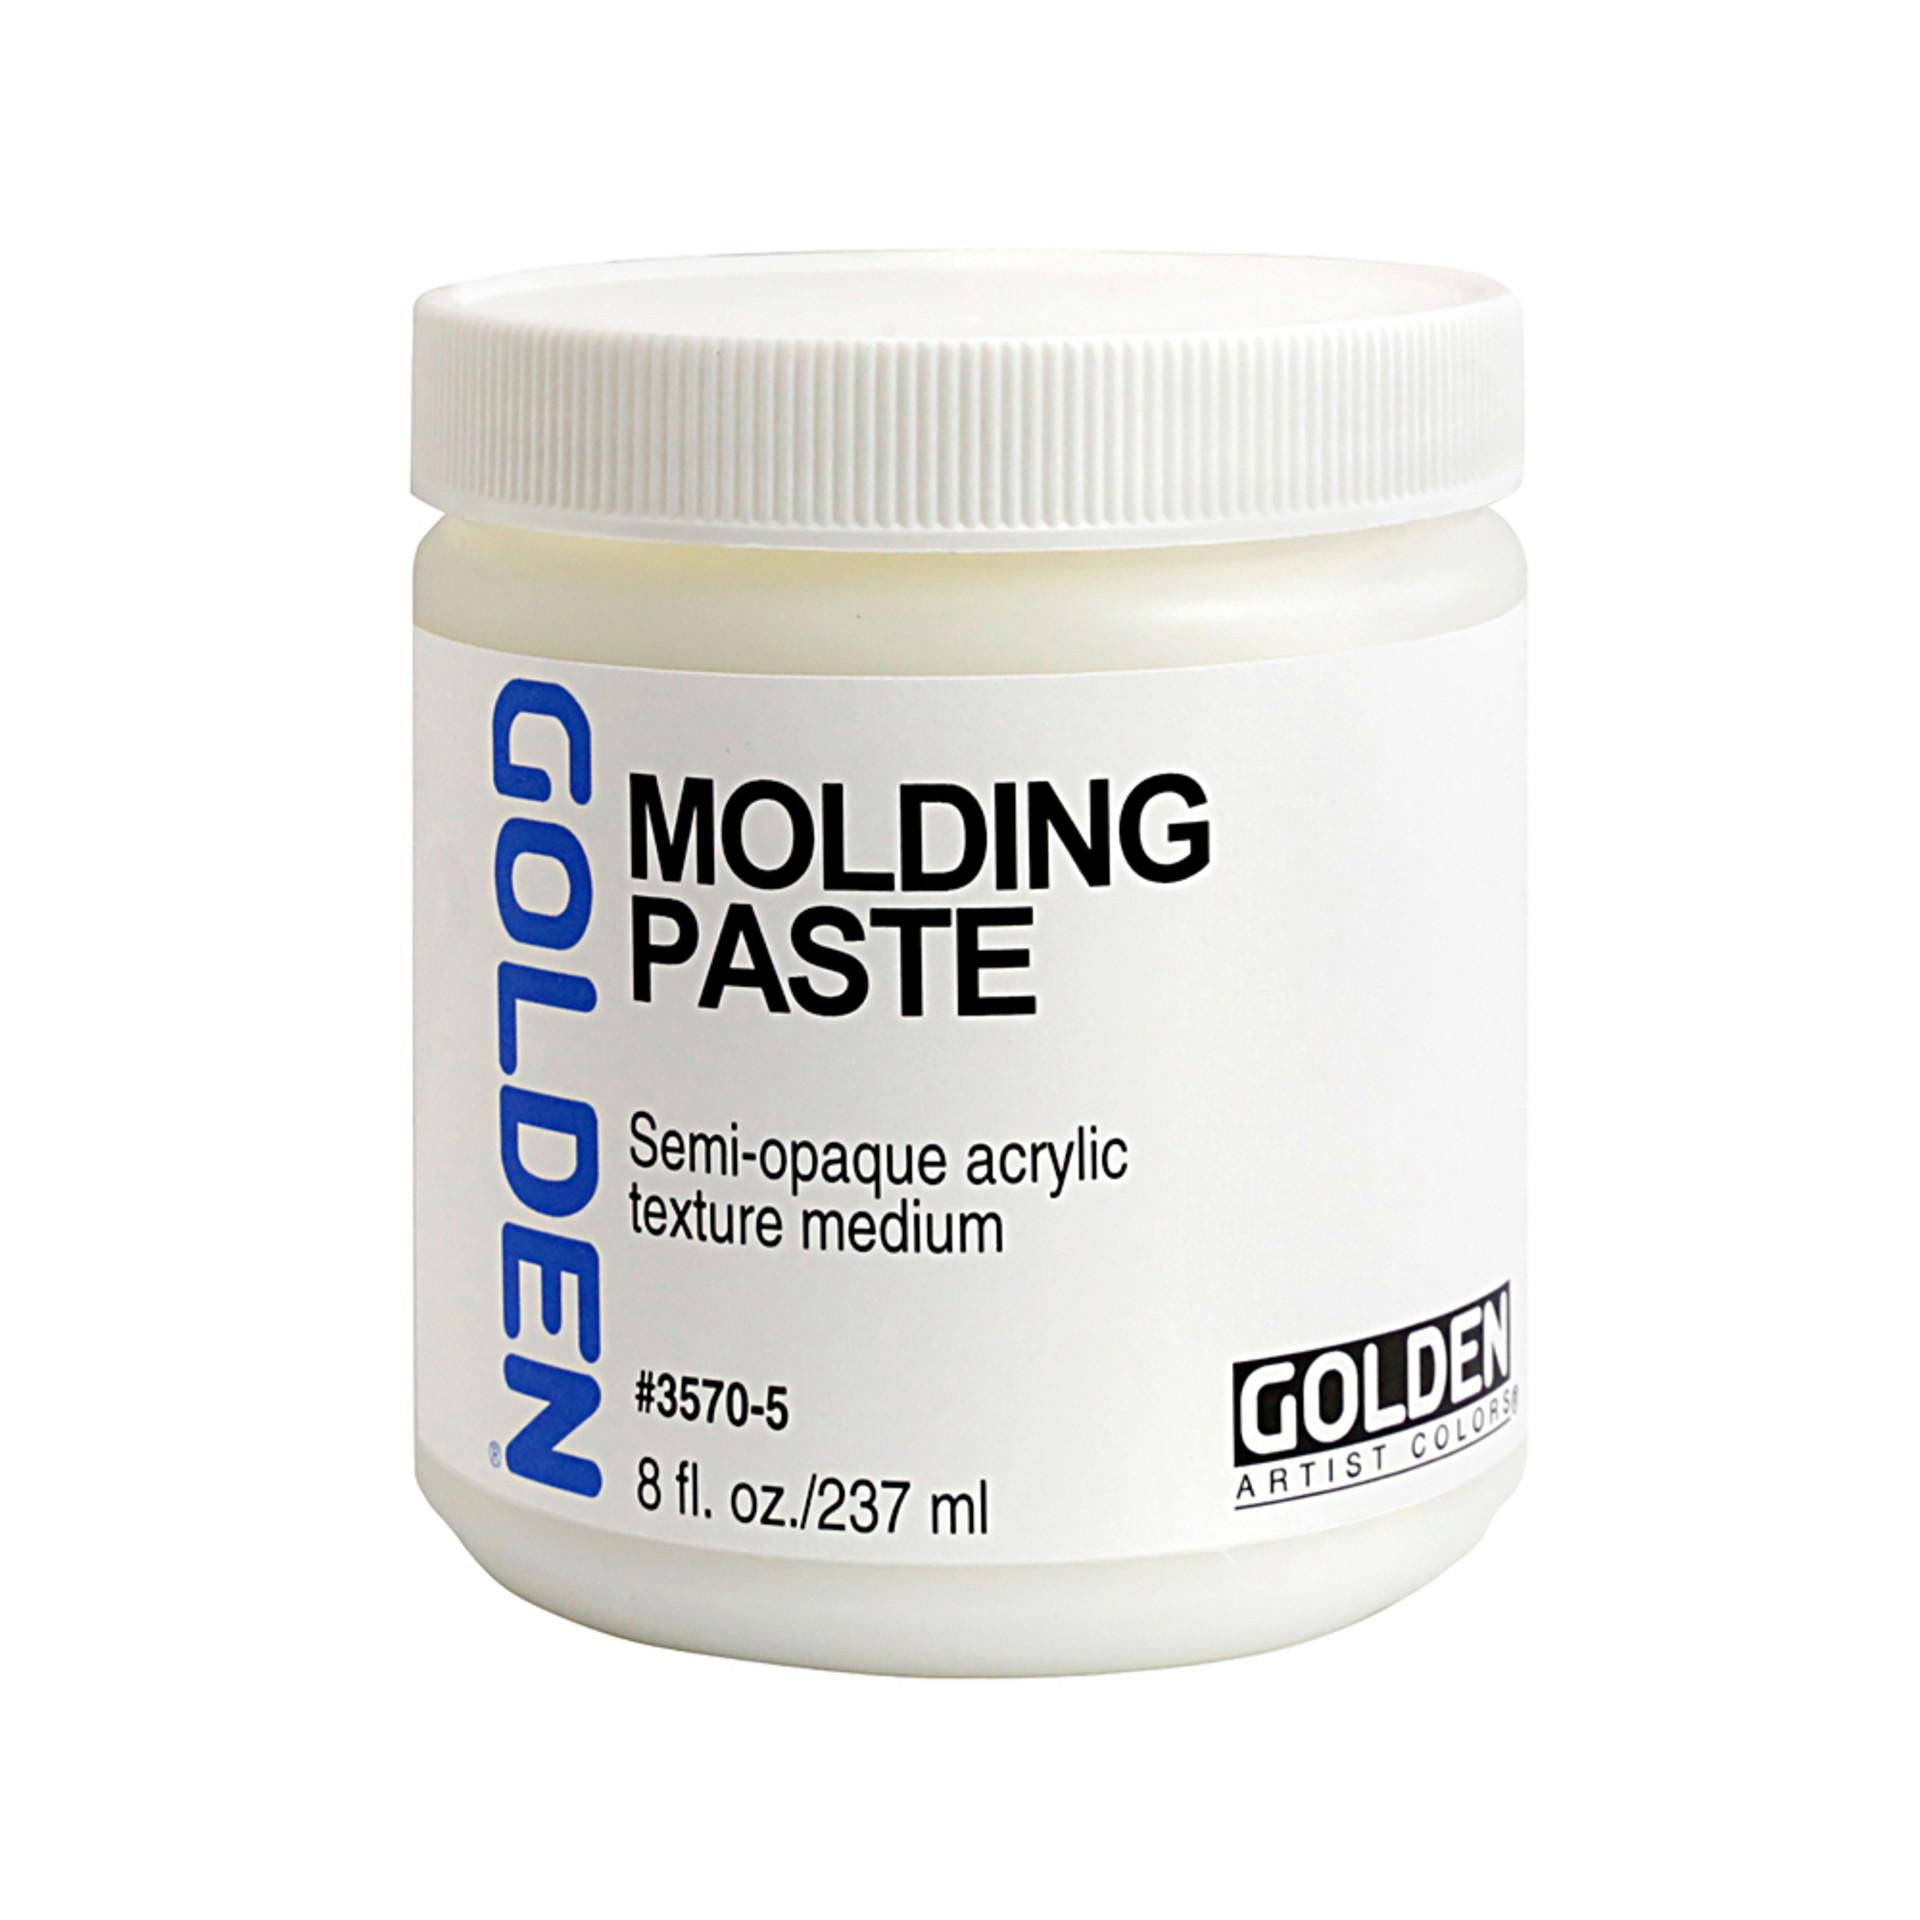 Golden 8oz Molding Paste